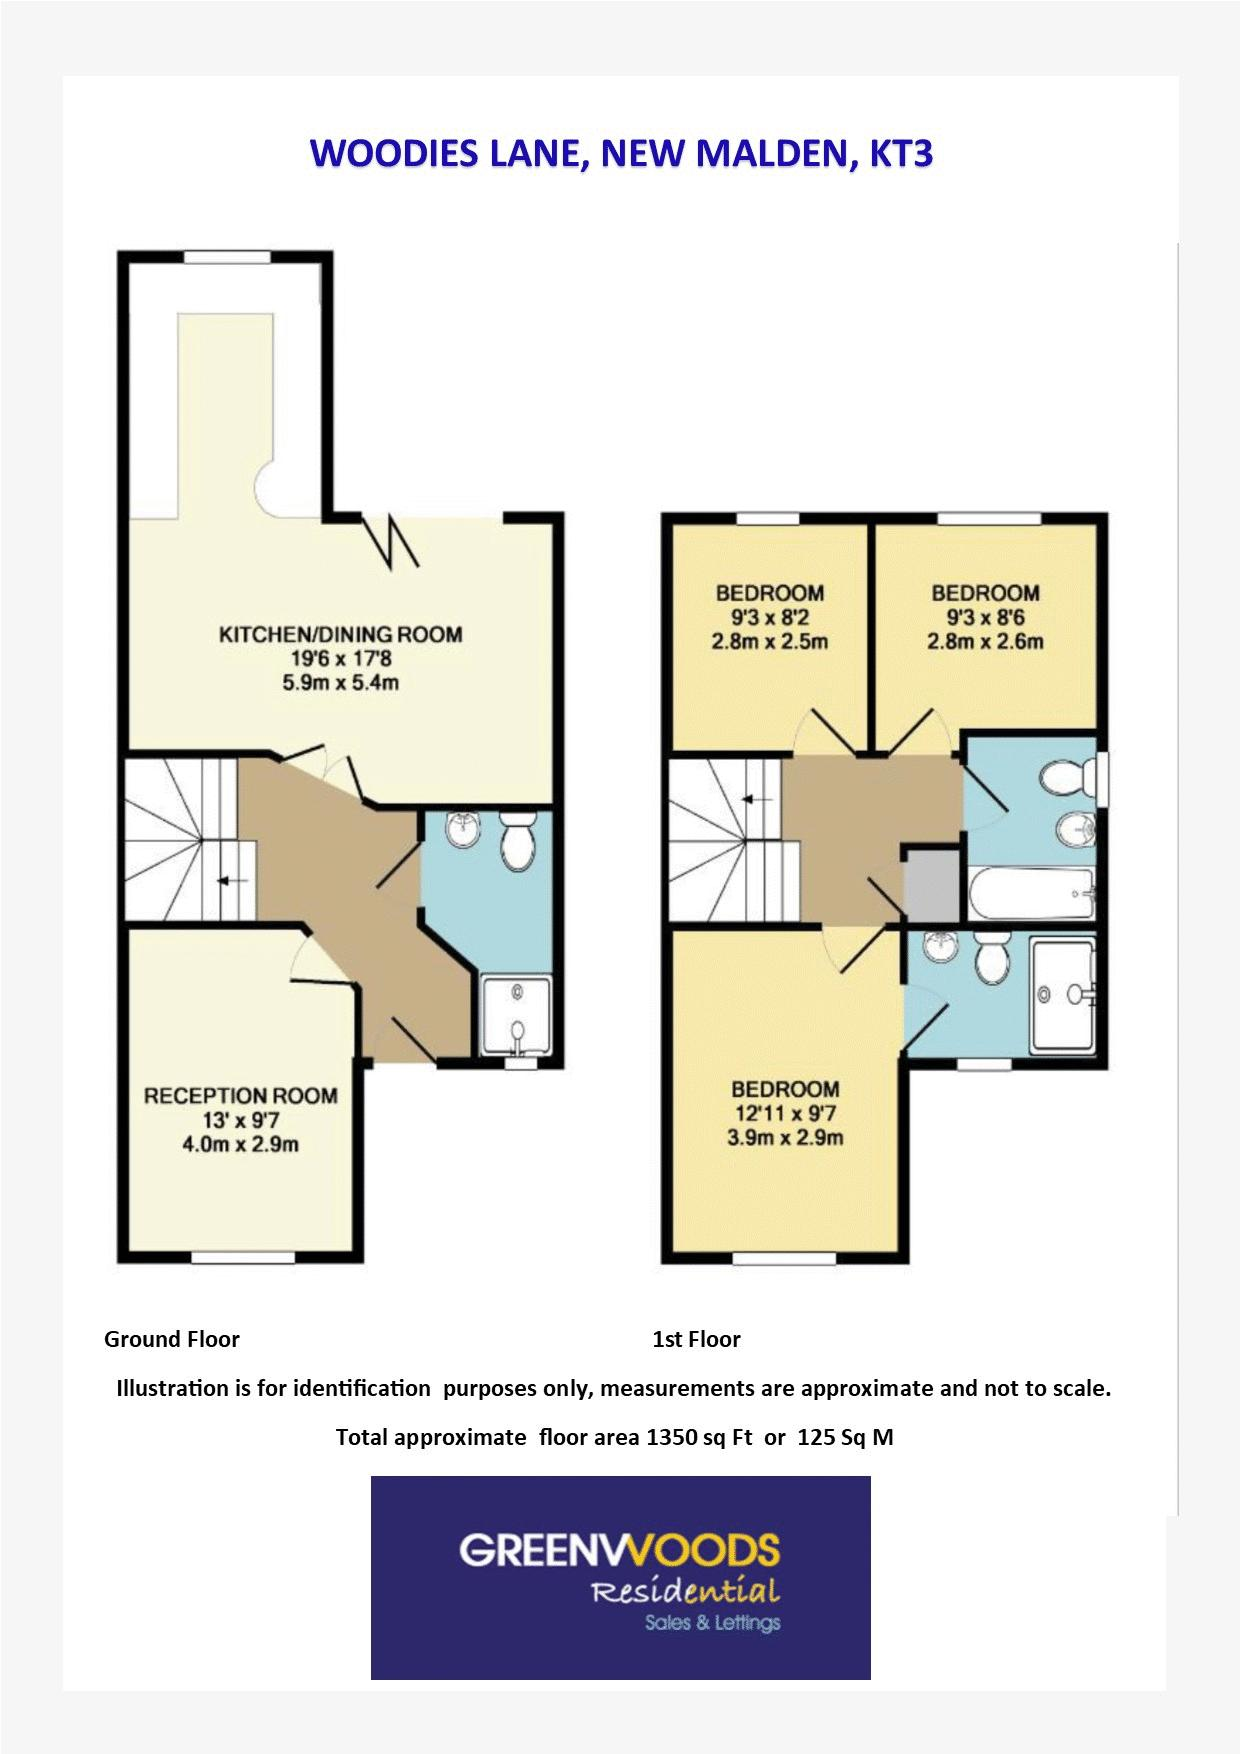 2D Floor Plan Woodies Lane